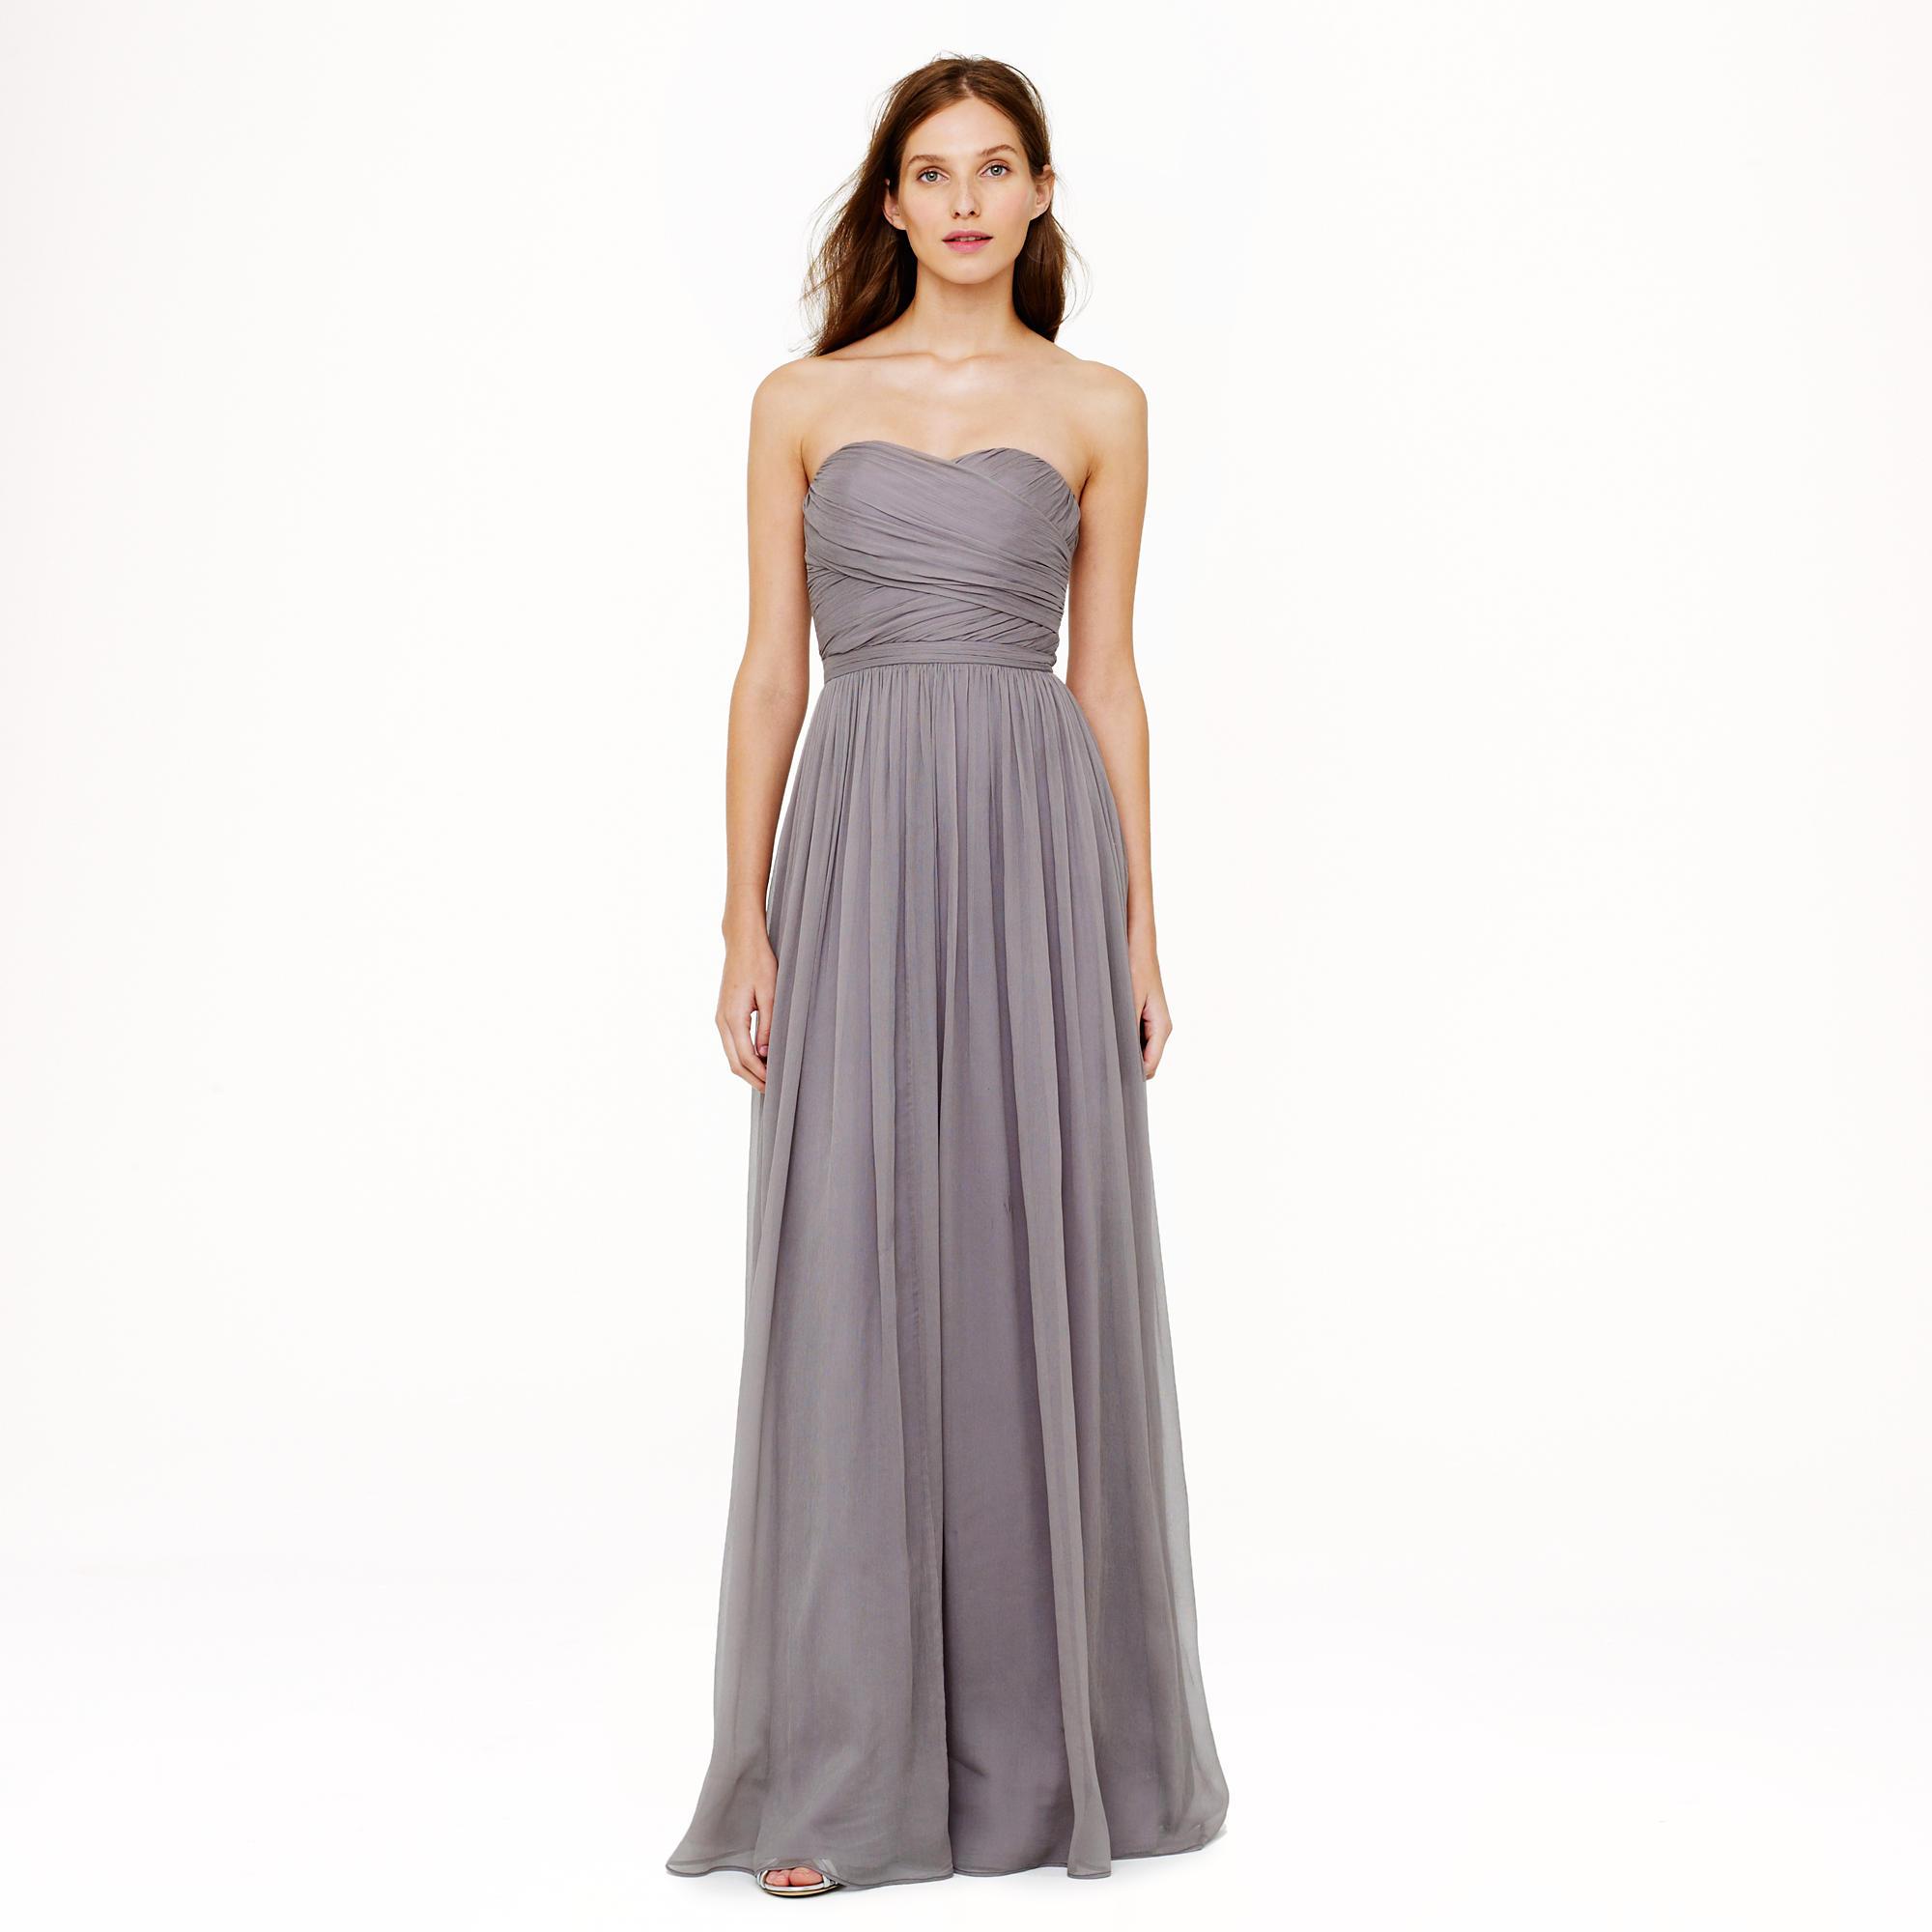 Arabelle long dress in silk chiffon : Wedding sizes 16 to 20 | J.Crew